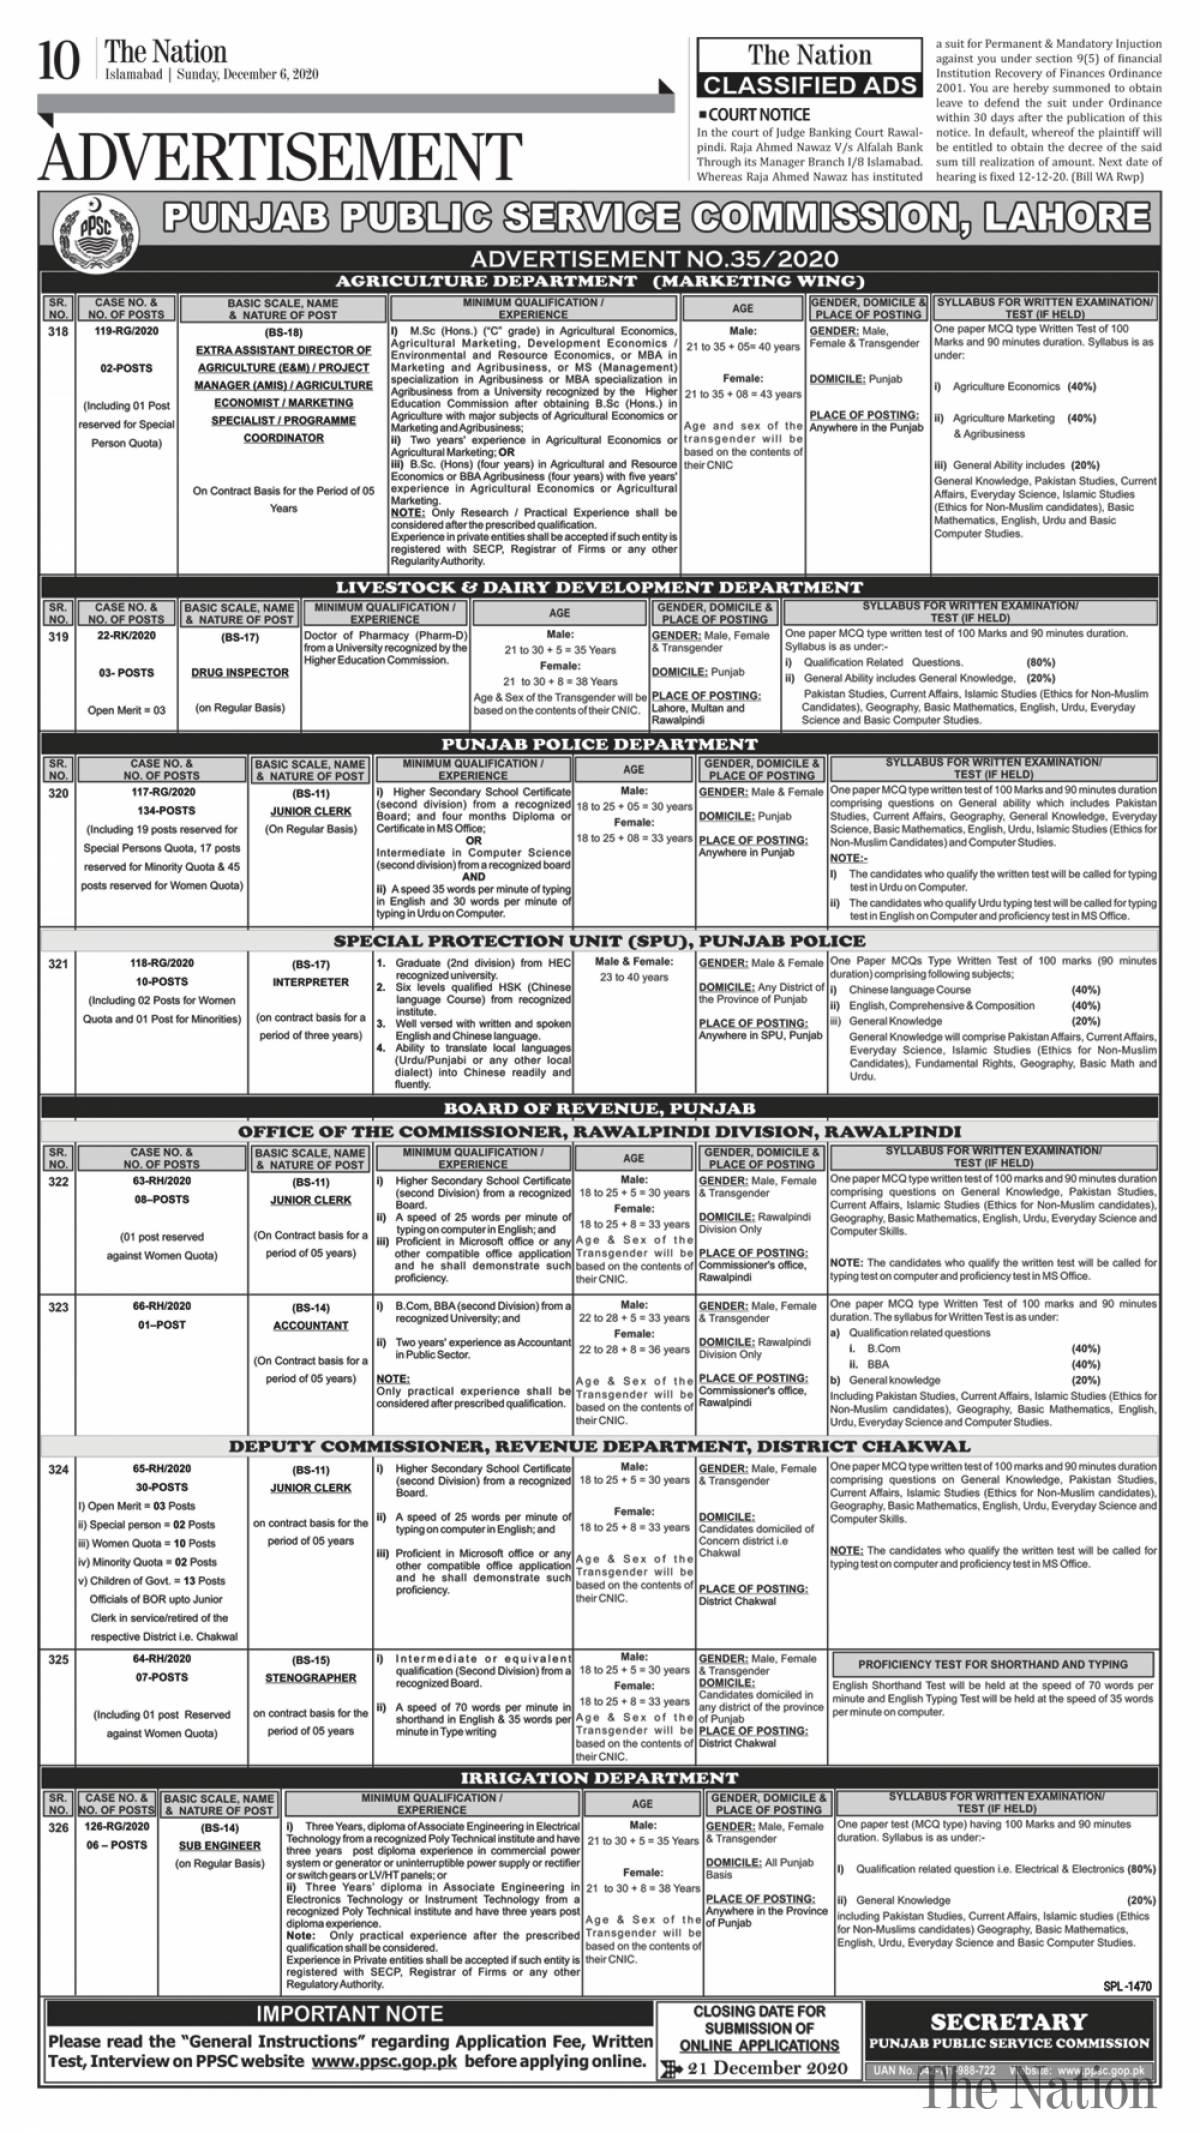 Punjab-Public-Service-Commission-PPSC-Punjab-Police-Jobs-2020.